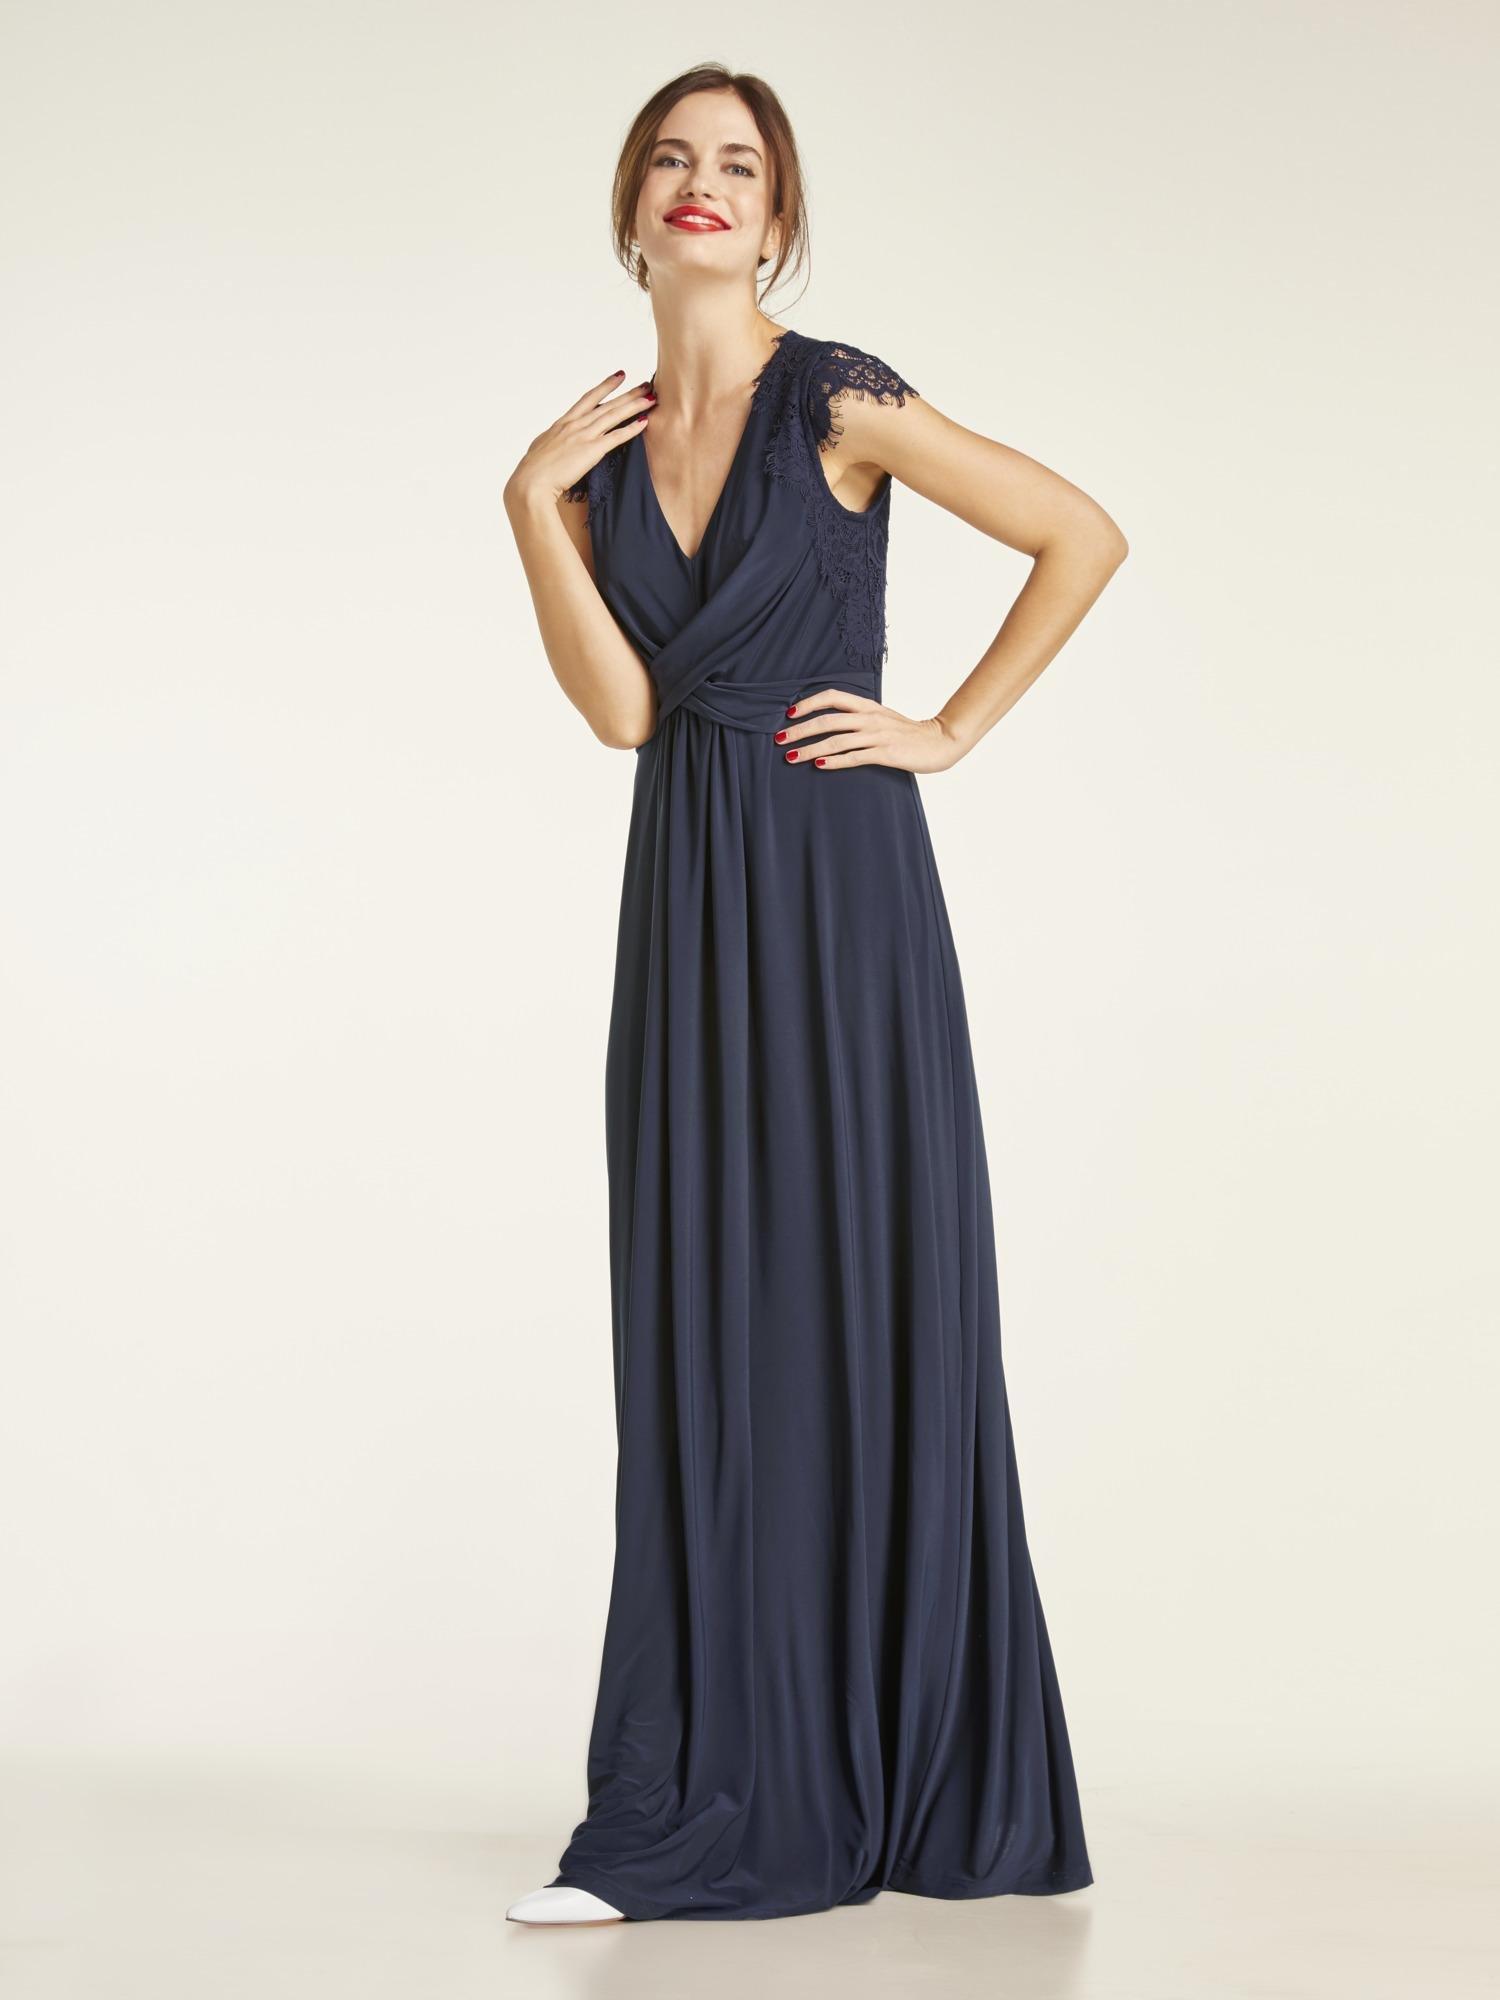 15 Schön Abendkleid Rückenausschnitt Bester PreisAbend Ausgezeichnet Abendkleid Rückenausschnitt Galerie